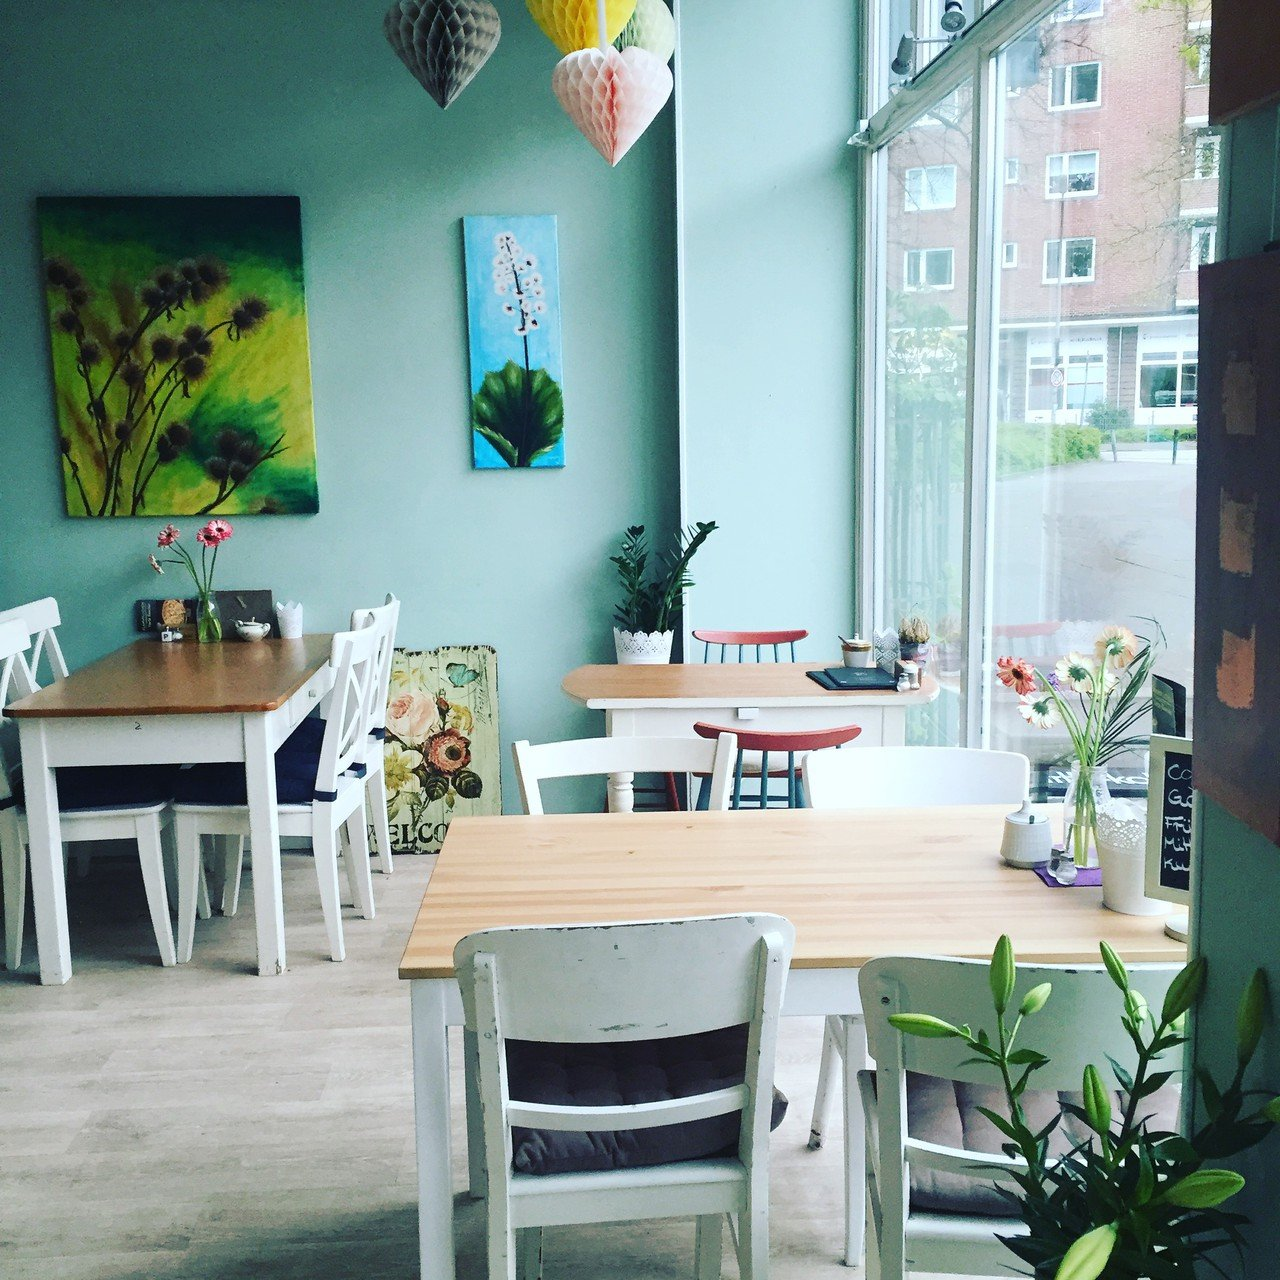 Hamburg workshop spaces Café Cafe Neo image 0